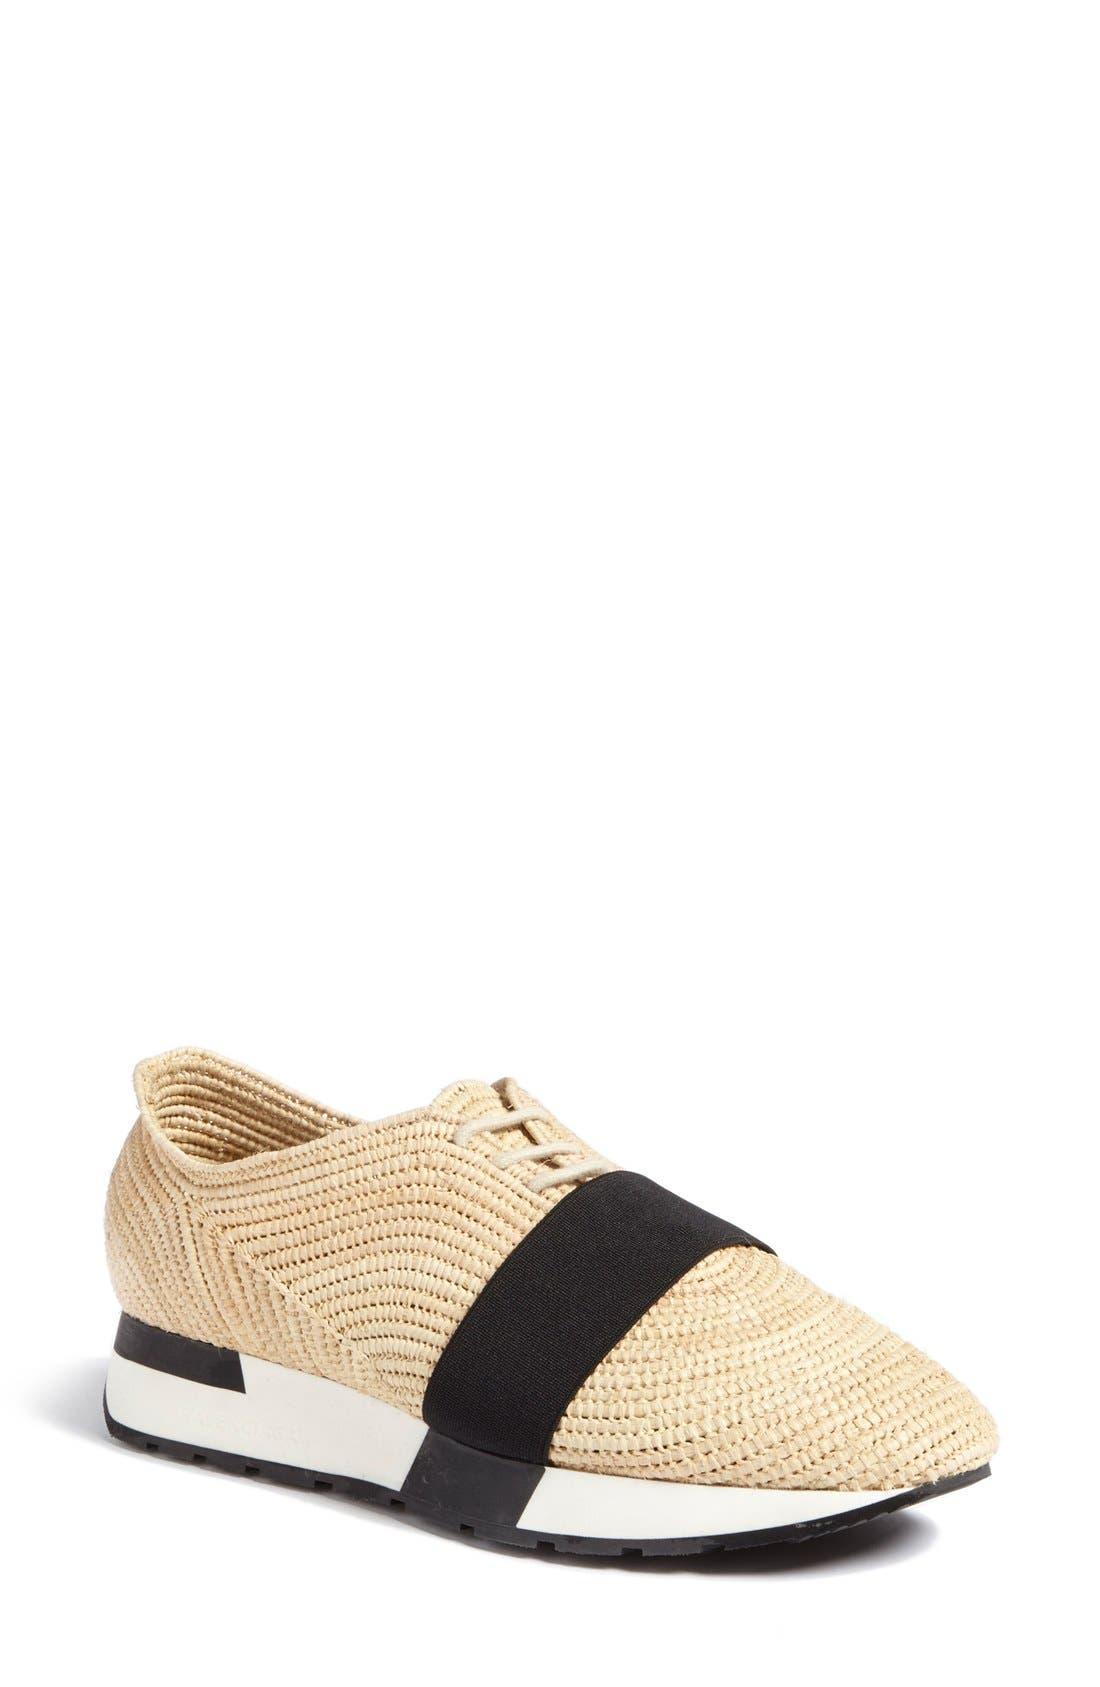 Alternate Image 1 Selected - Balenciaga 'Runner' Raffia Sneaker (Women)